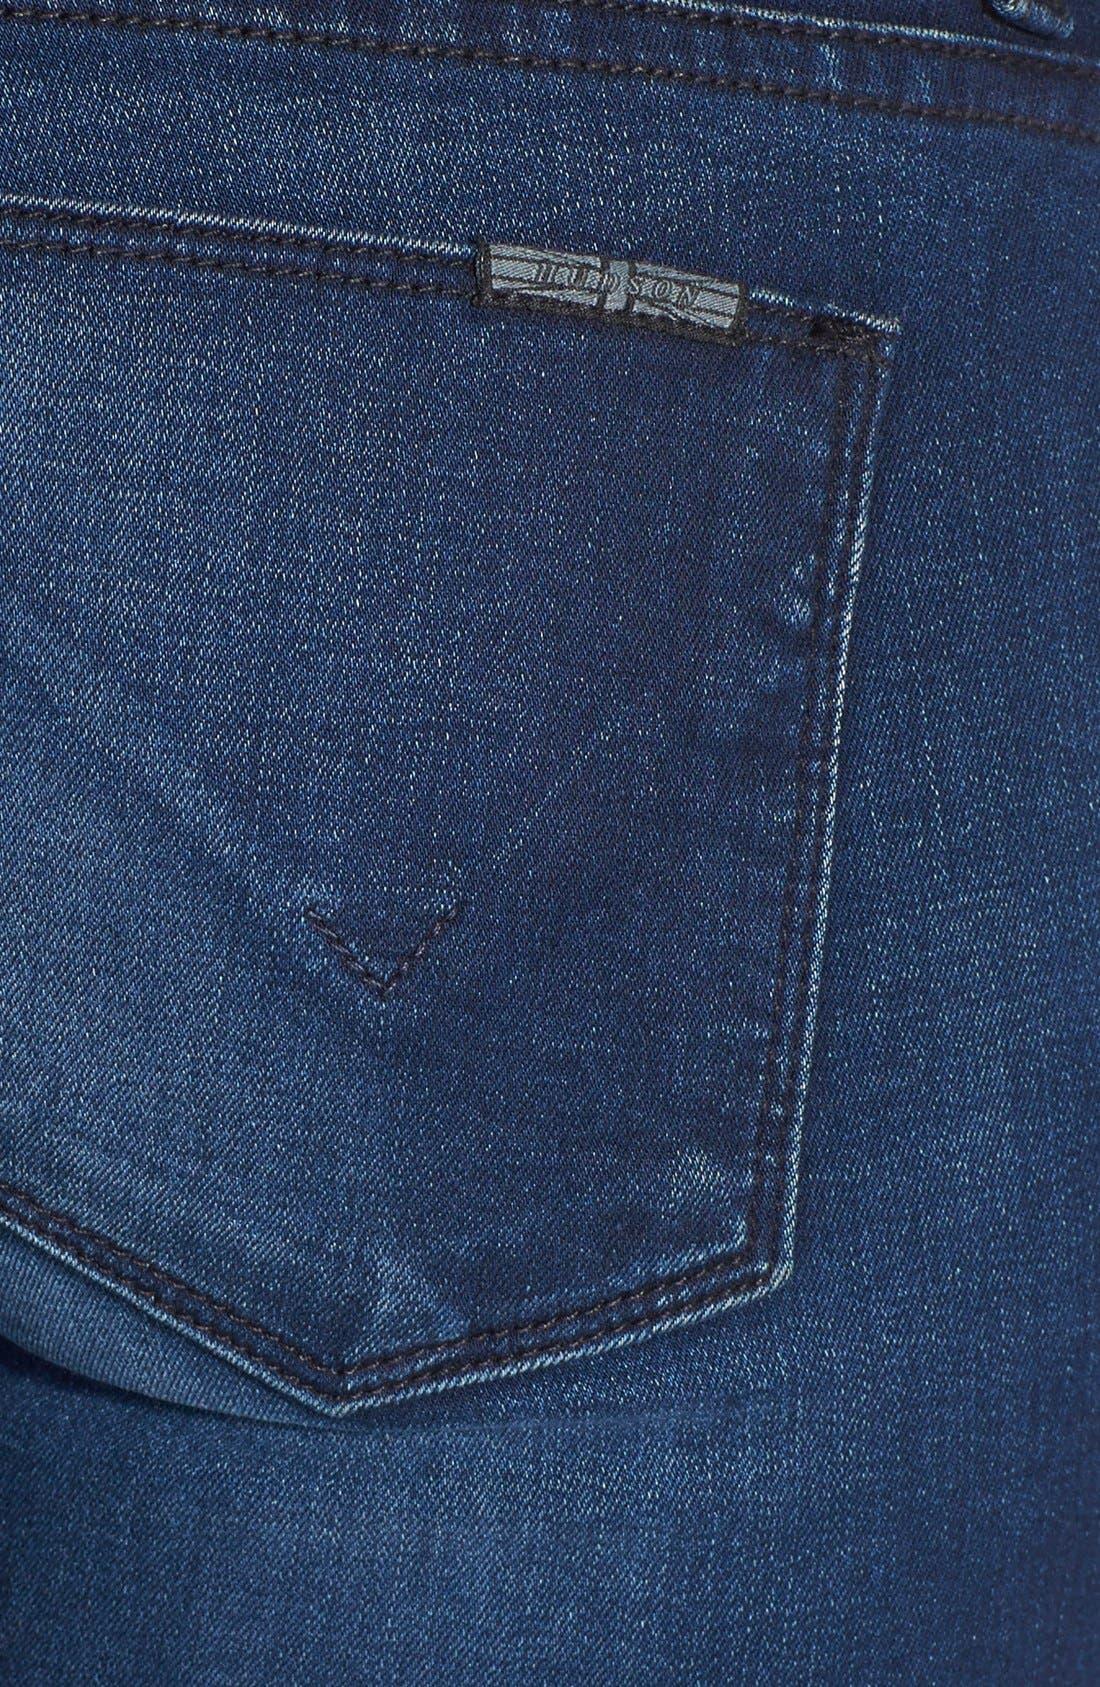 Alternate Image 3  - Hudson Jeans 'Krista' Super Skinny Crop Jeans (Contrary)